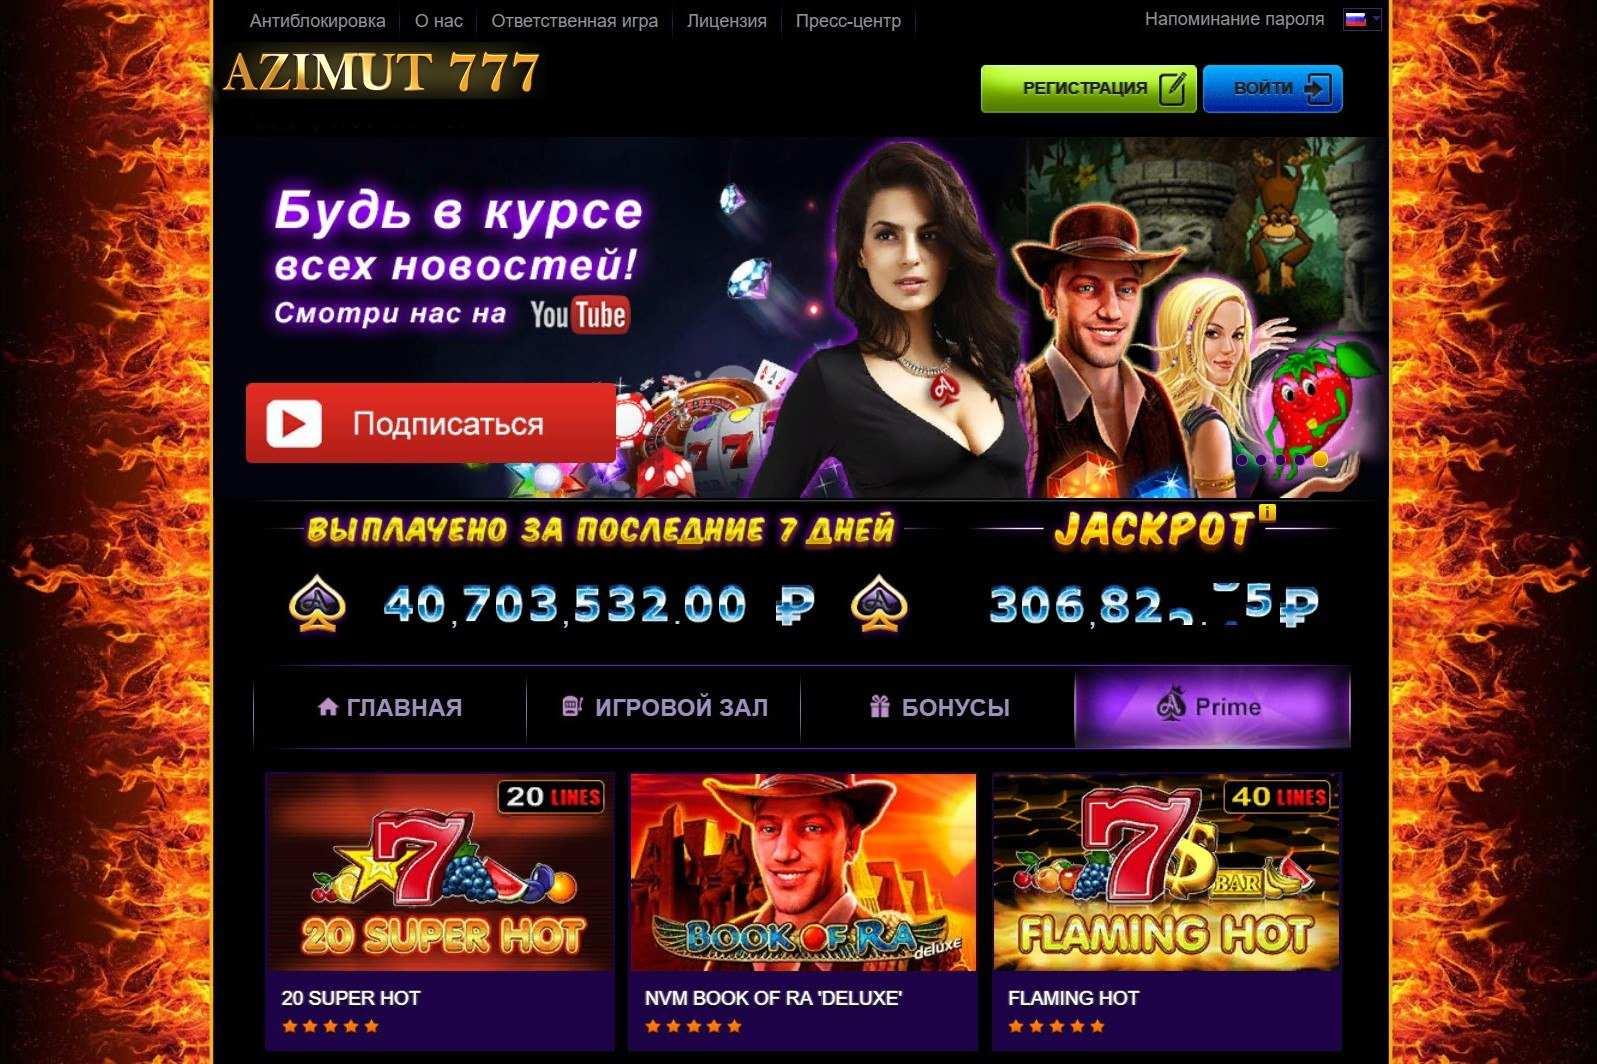 Обзор казино Azimut 777